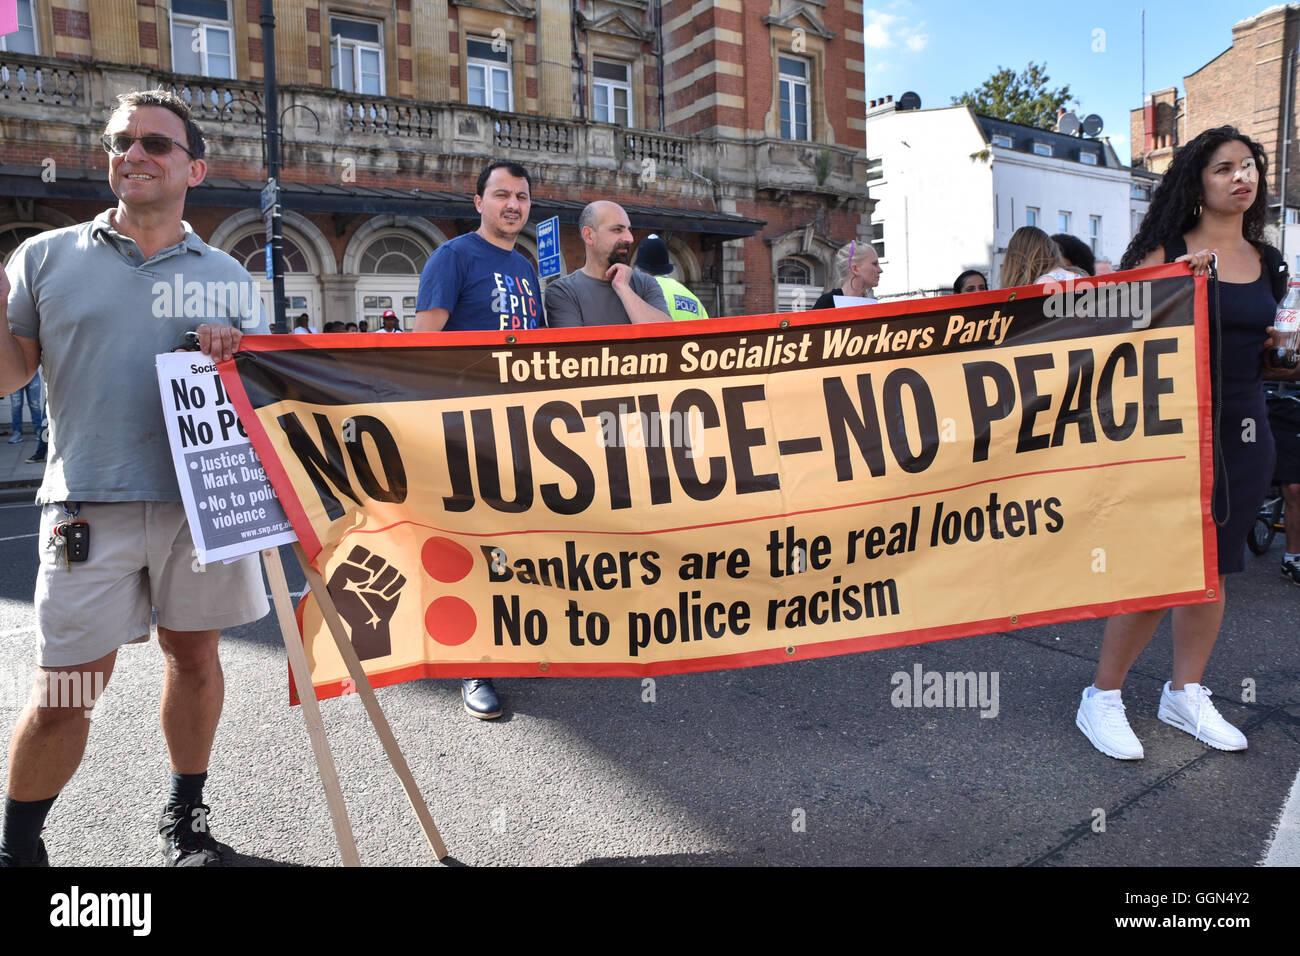 Tottenham High Road, London, UK. 6th August 2016. Relatives and friends of Mark Duggan mark the 5th anniversary - Stock Image